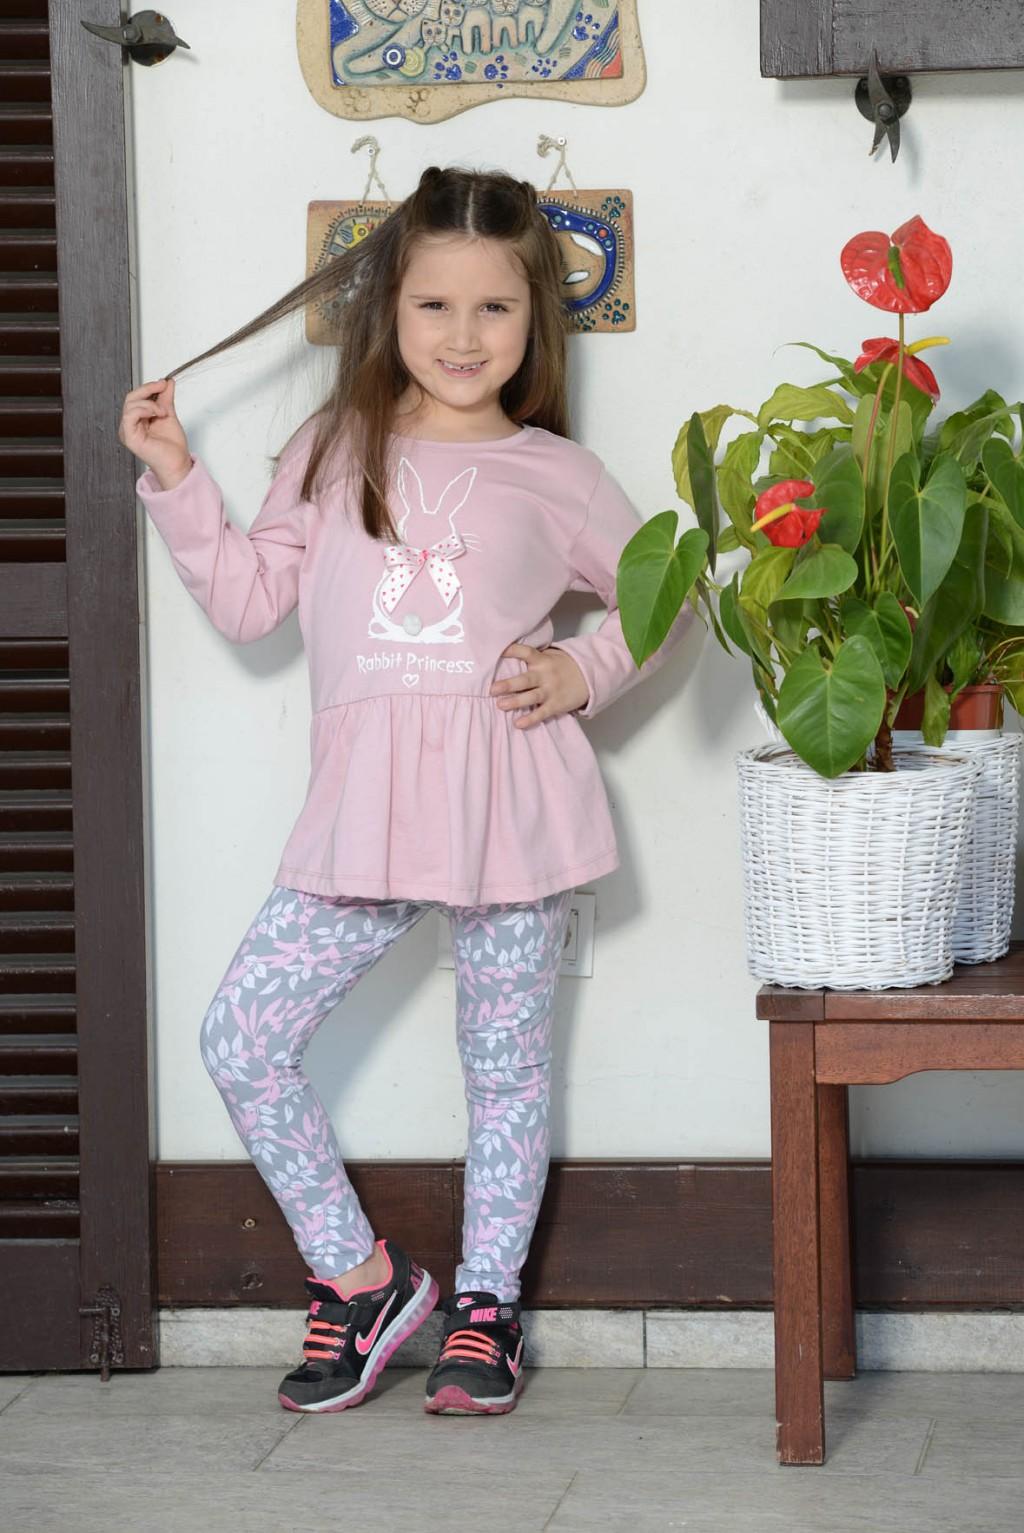 Турецкий трикотаж для дома и отдыха для всей семьи - Озкан. Осенние новинки